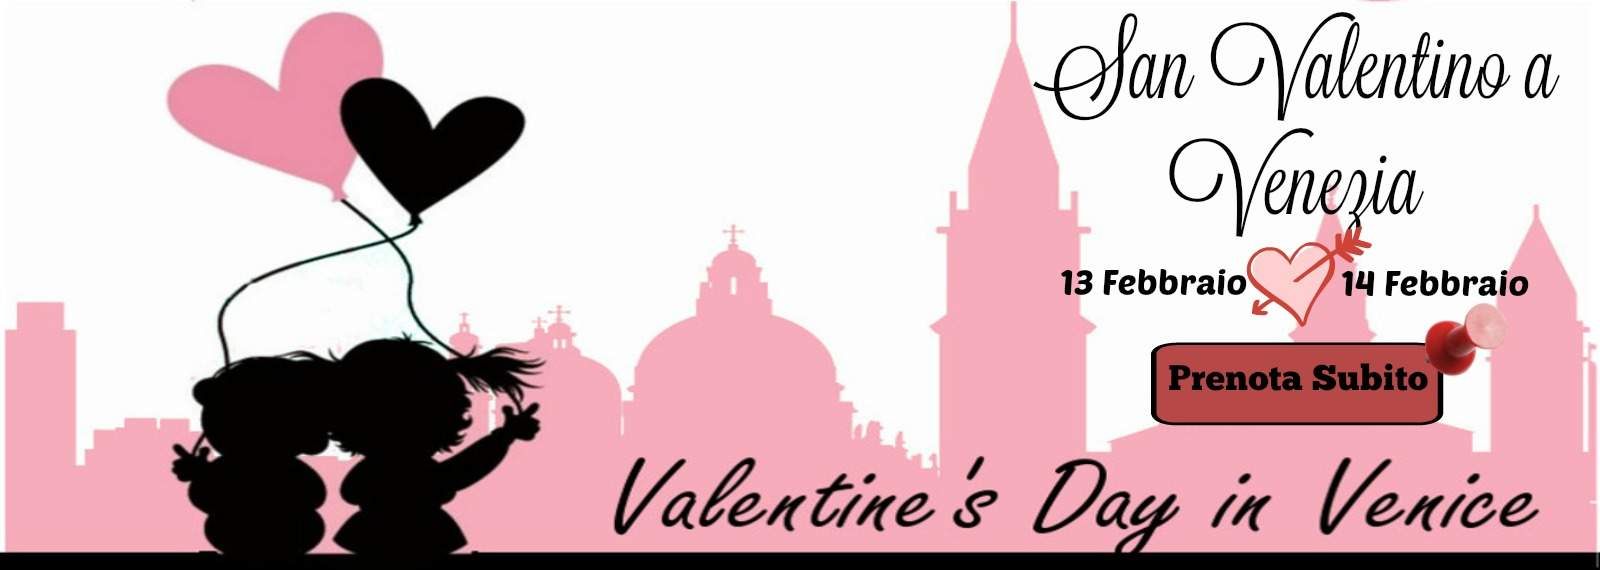 San Valentino a Venezia 2016